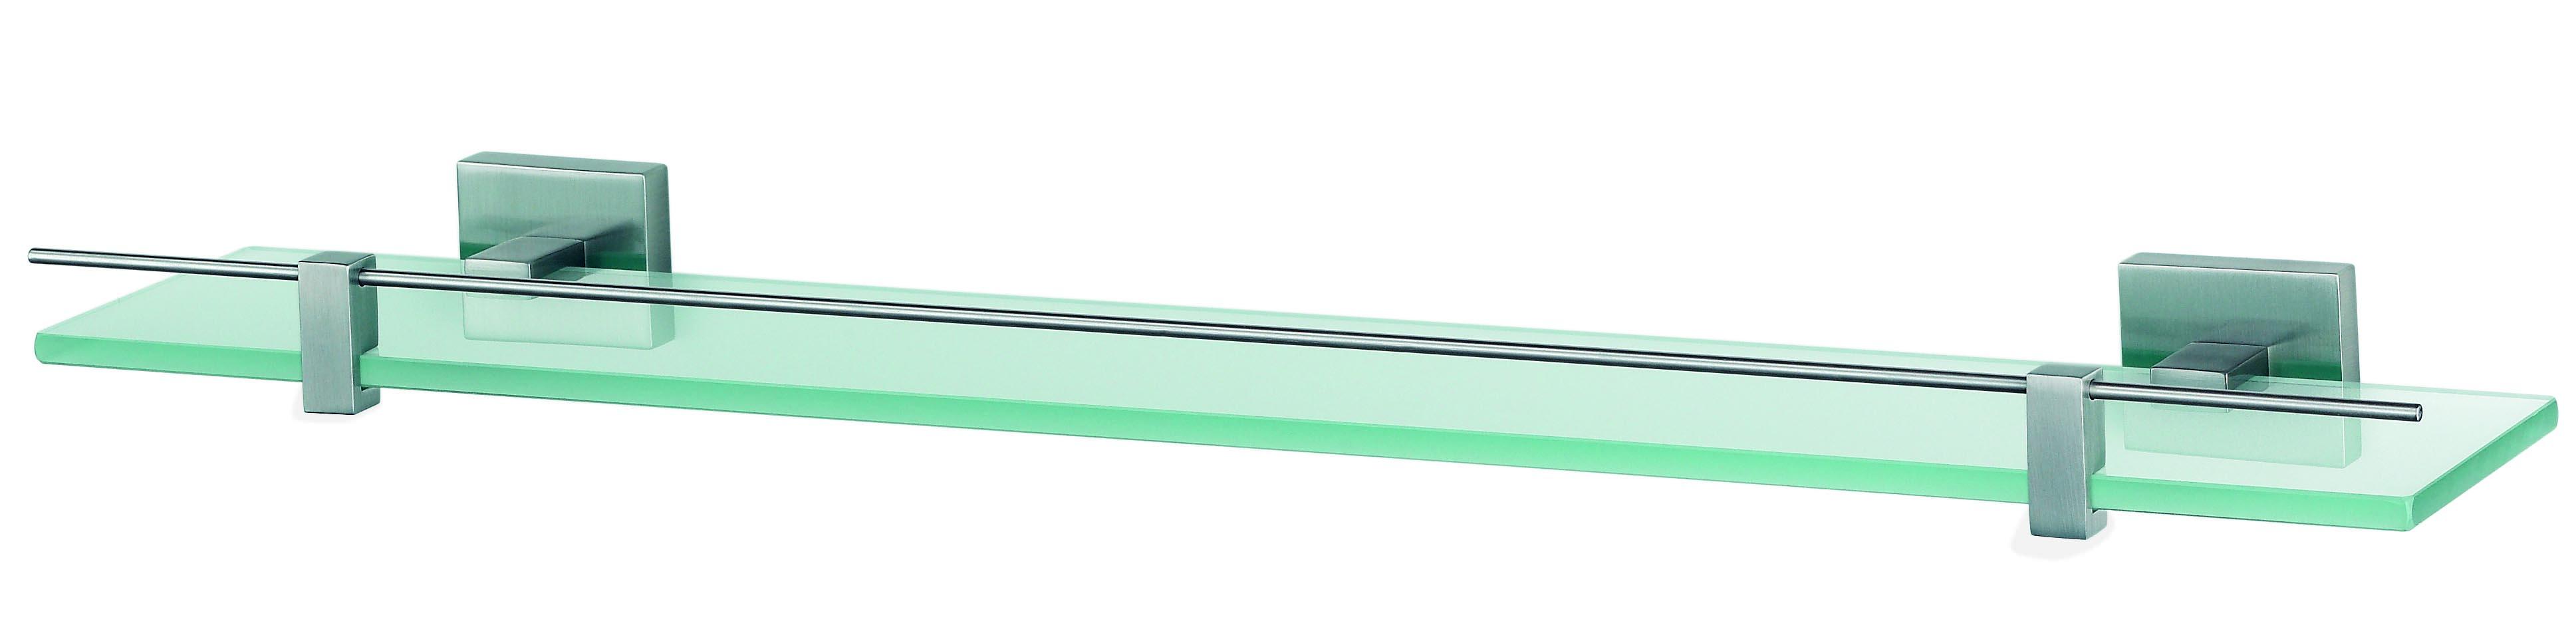 Haceka Mezzo planchet 60x12.7cm mat chroom